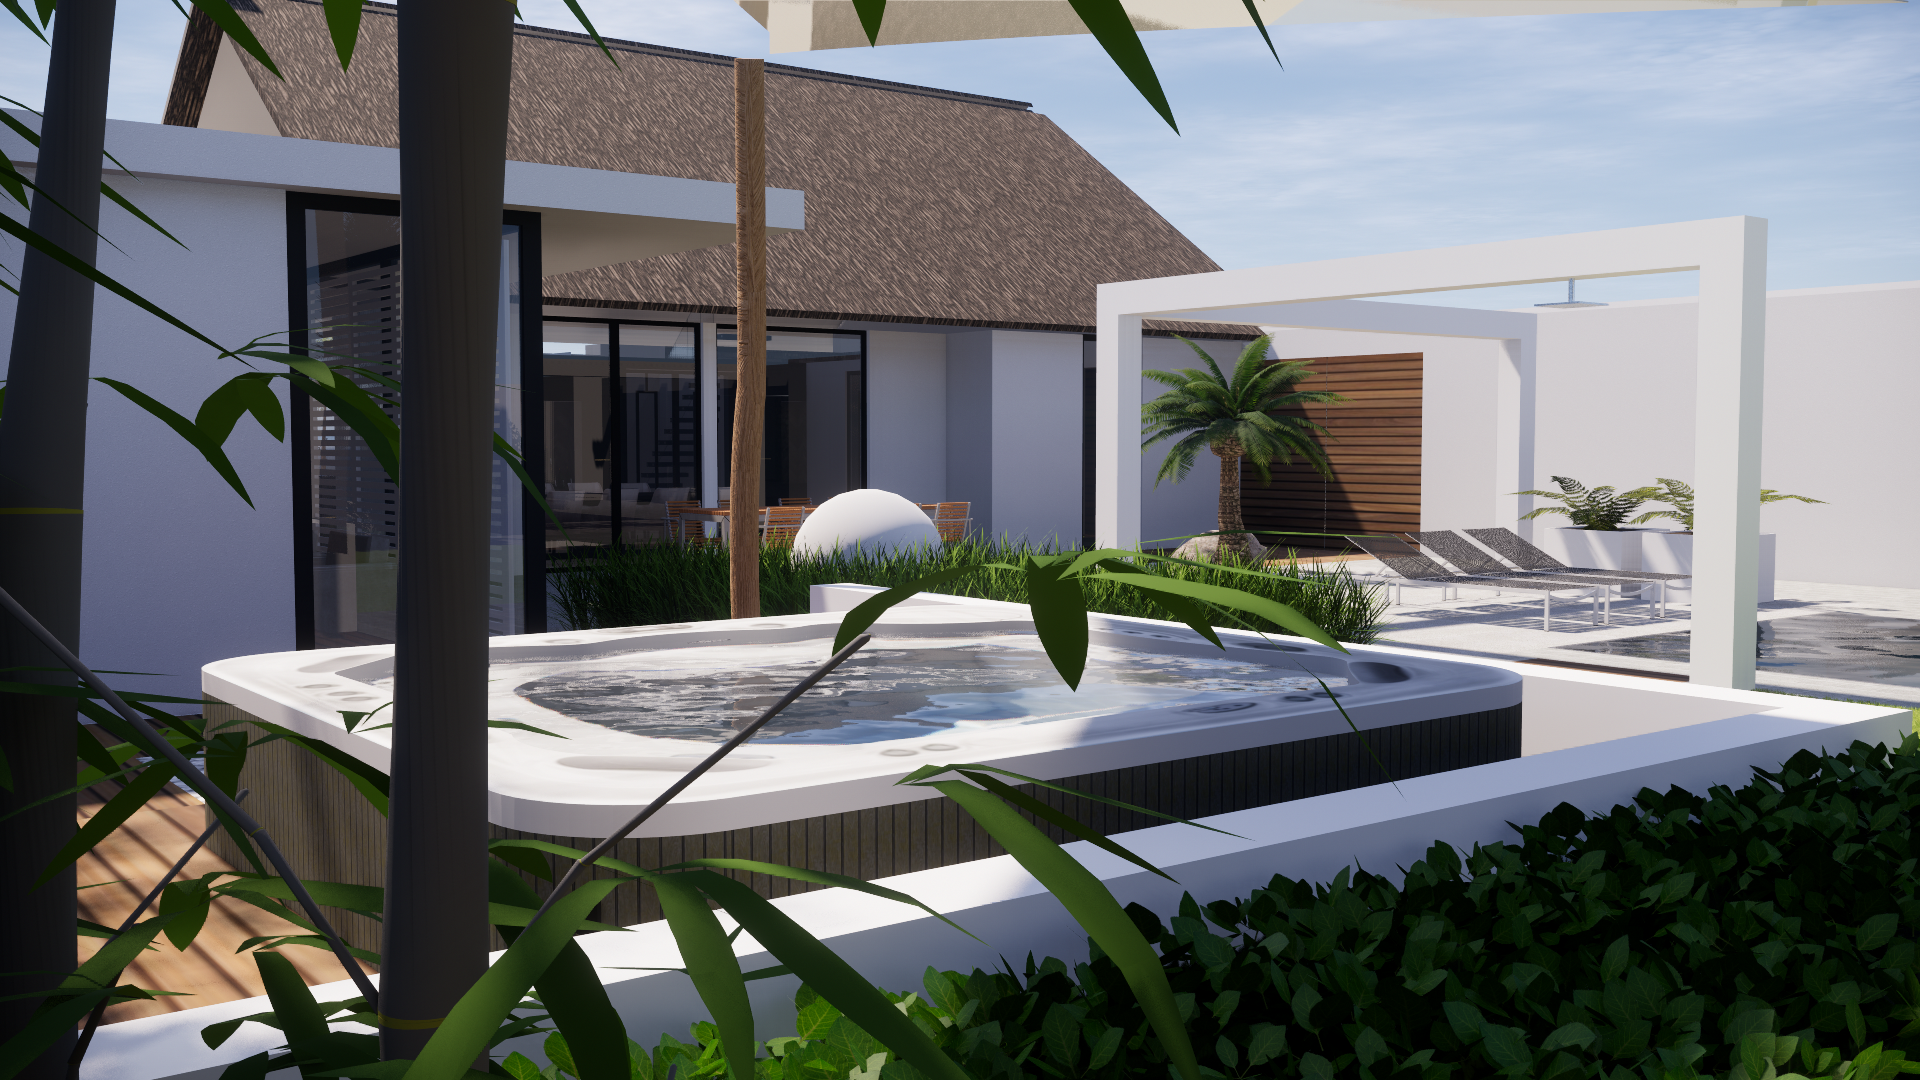 Ibiza-stijl achtertuin.png